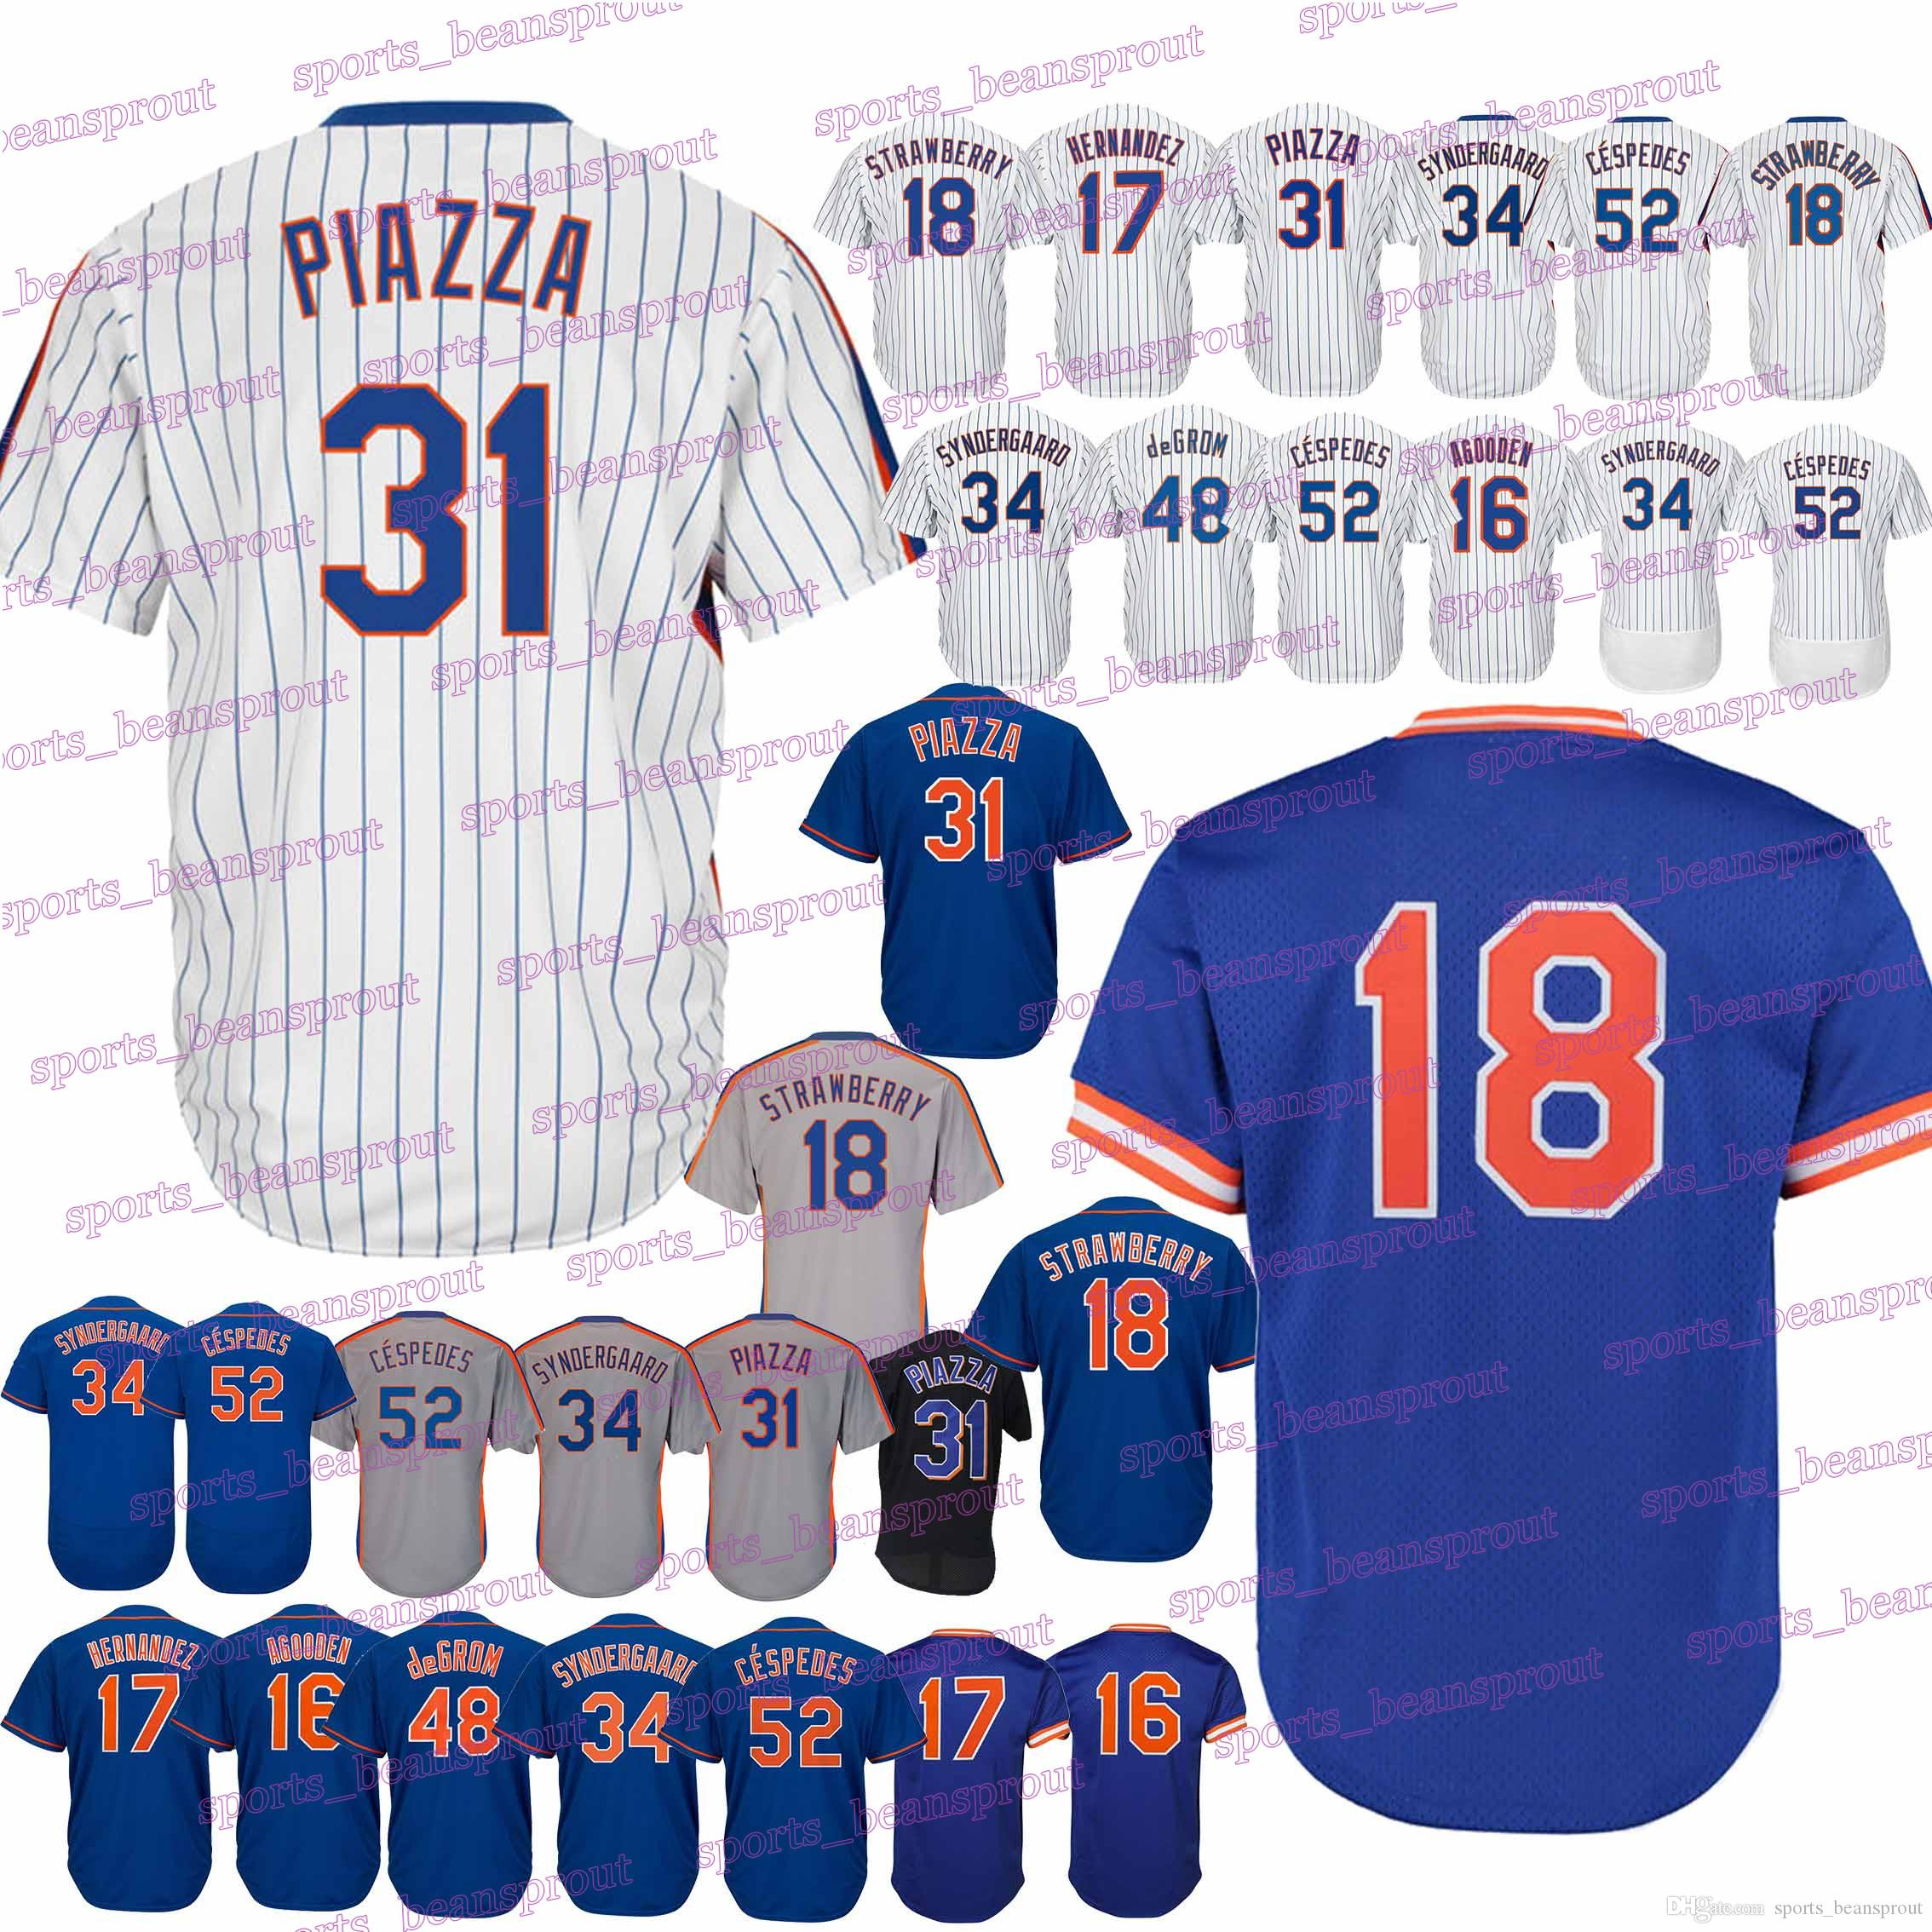 official photos 9f81e e09b5 New York 16 Dwight Gooden Mets Jerseys 17 Keith Hernandez Jersey 18 Darryl  Strawberry Jerseys Baseball Jerseys